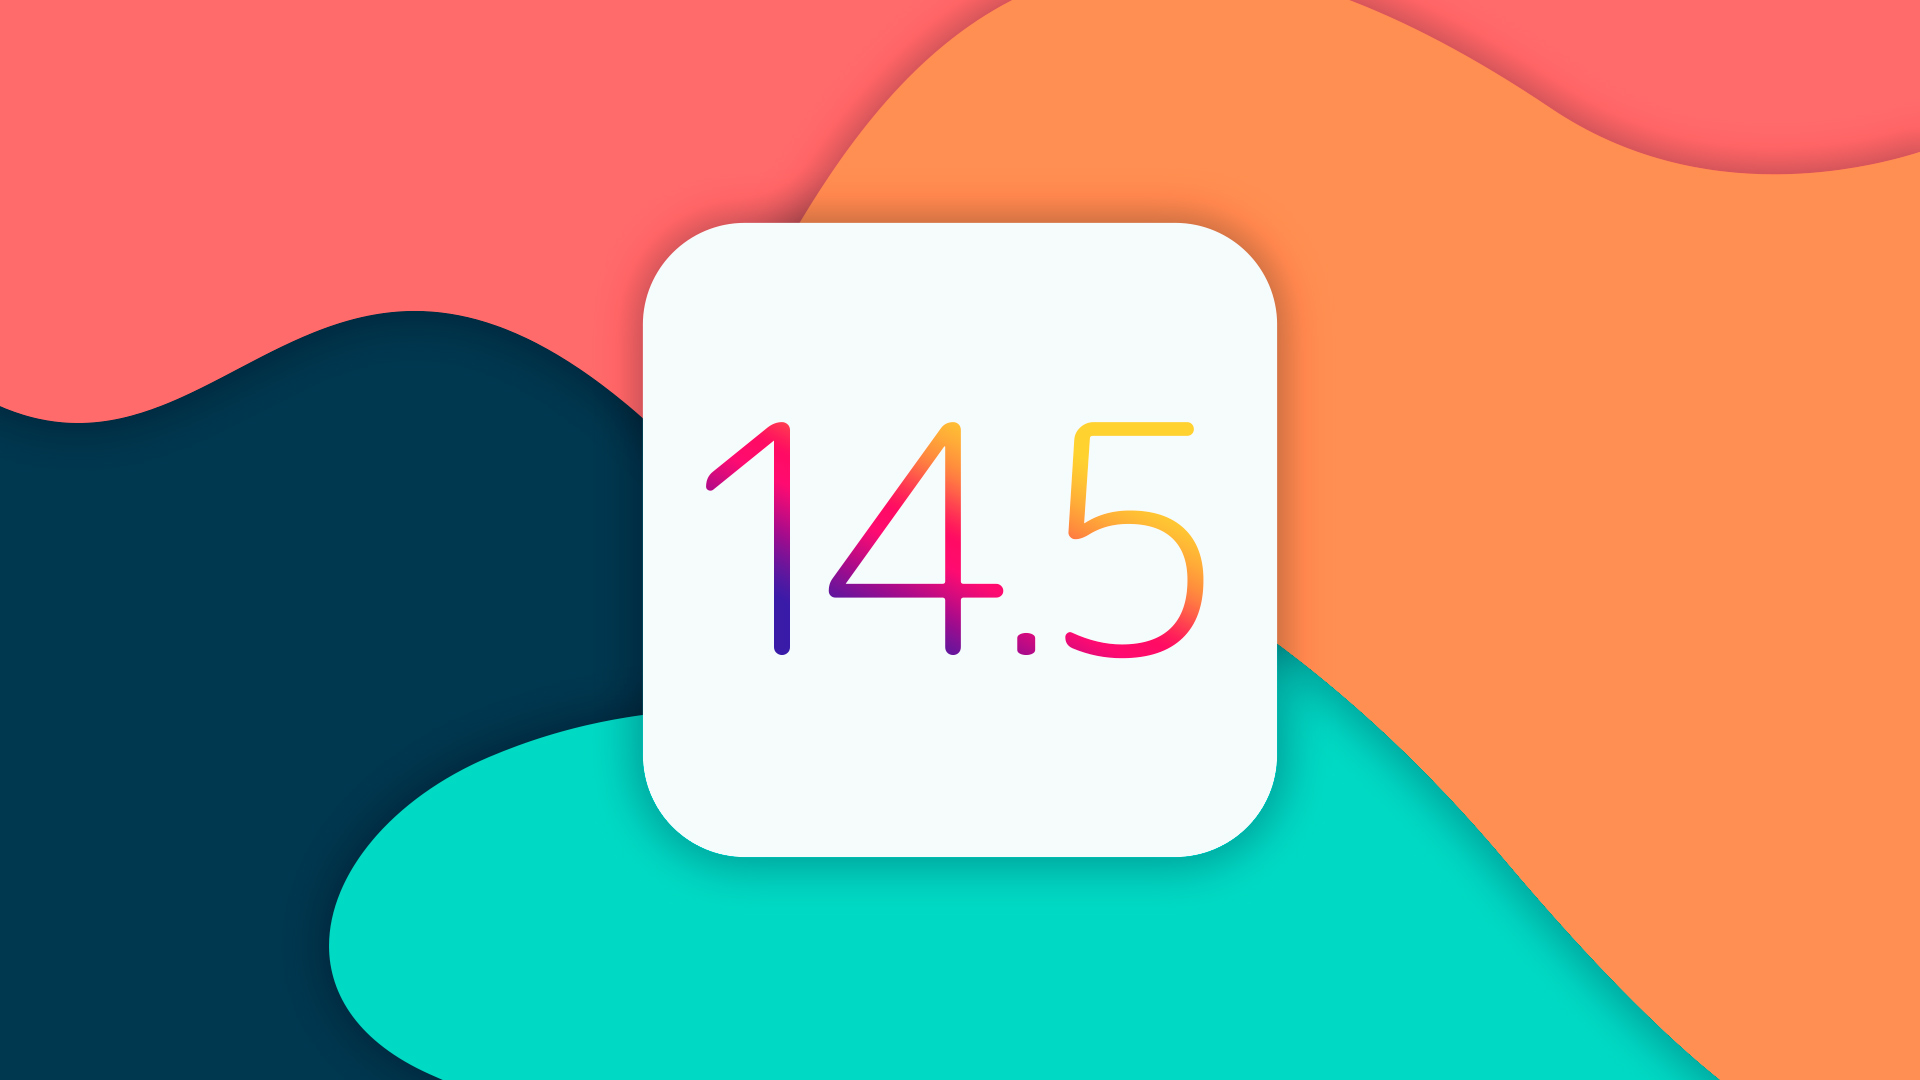 Betriebssystem, Apple, iOS, iPadOS, Apple iOS, Apple iPadOS, iOS Update, 14, iOS 14.5, iPadOS 14.5, 14.5